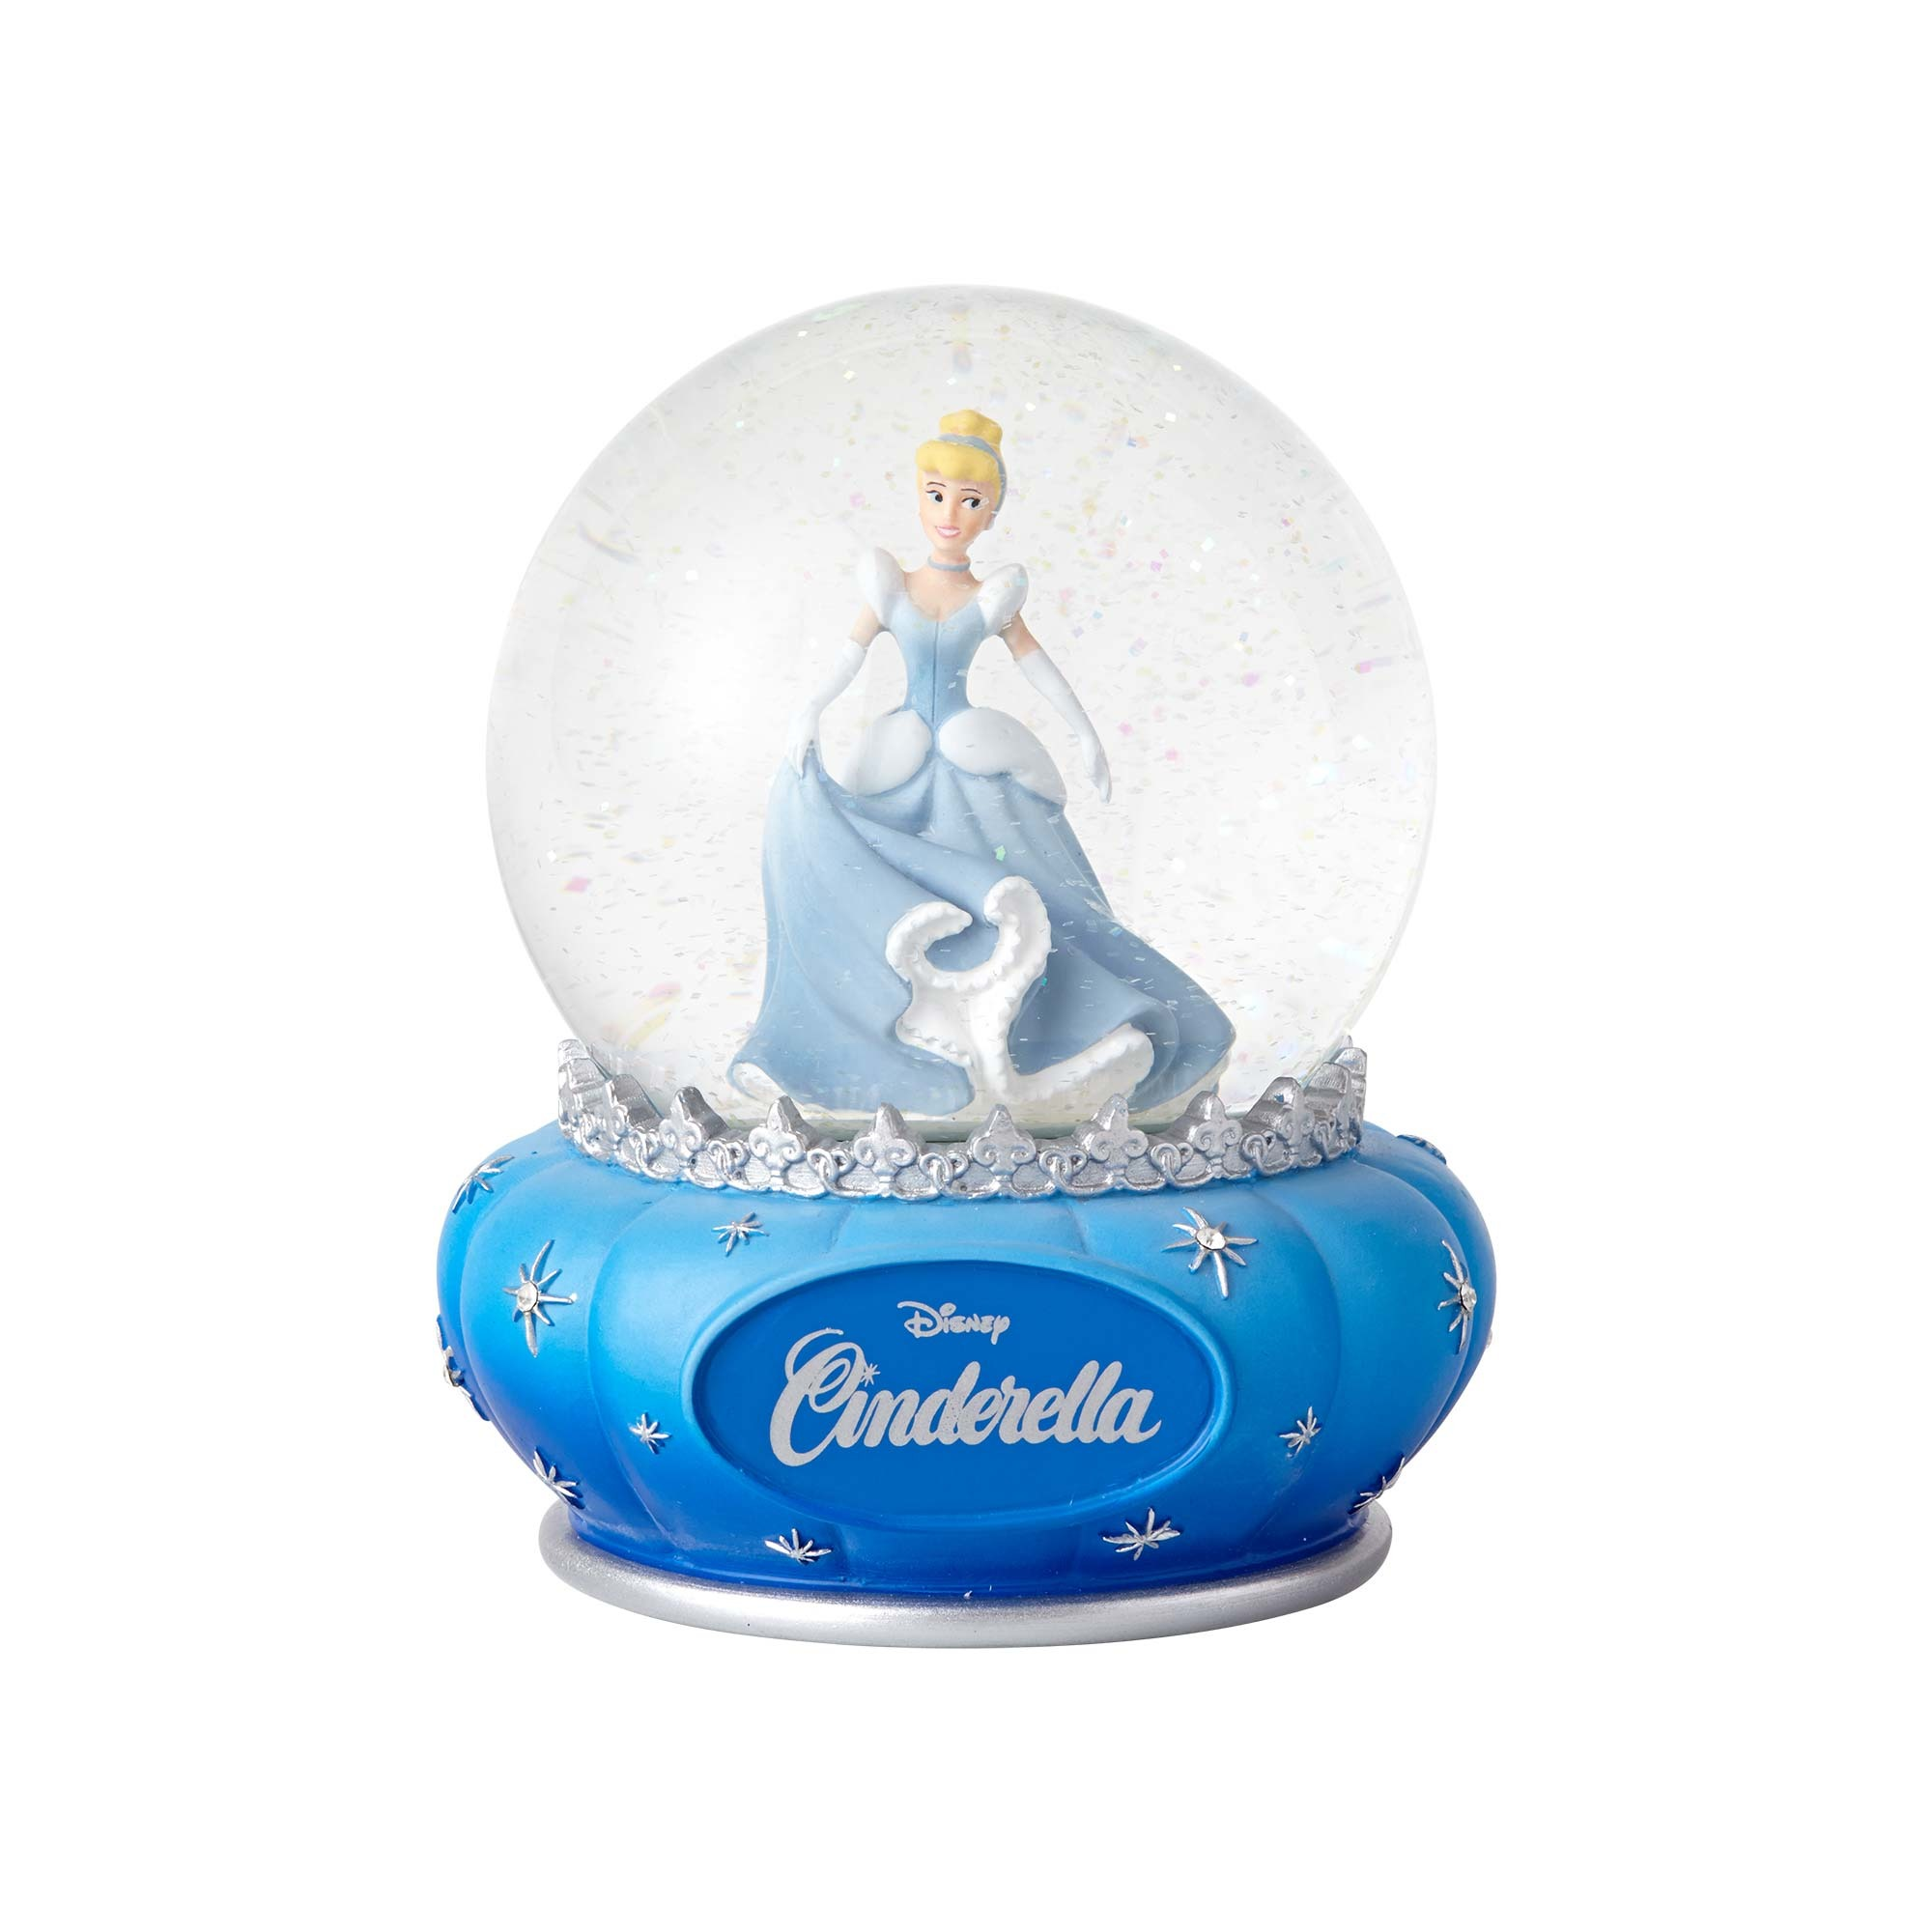 Cinderella Globe